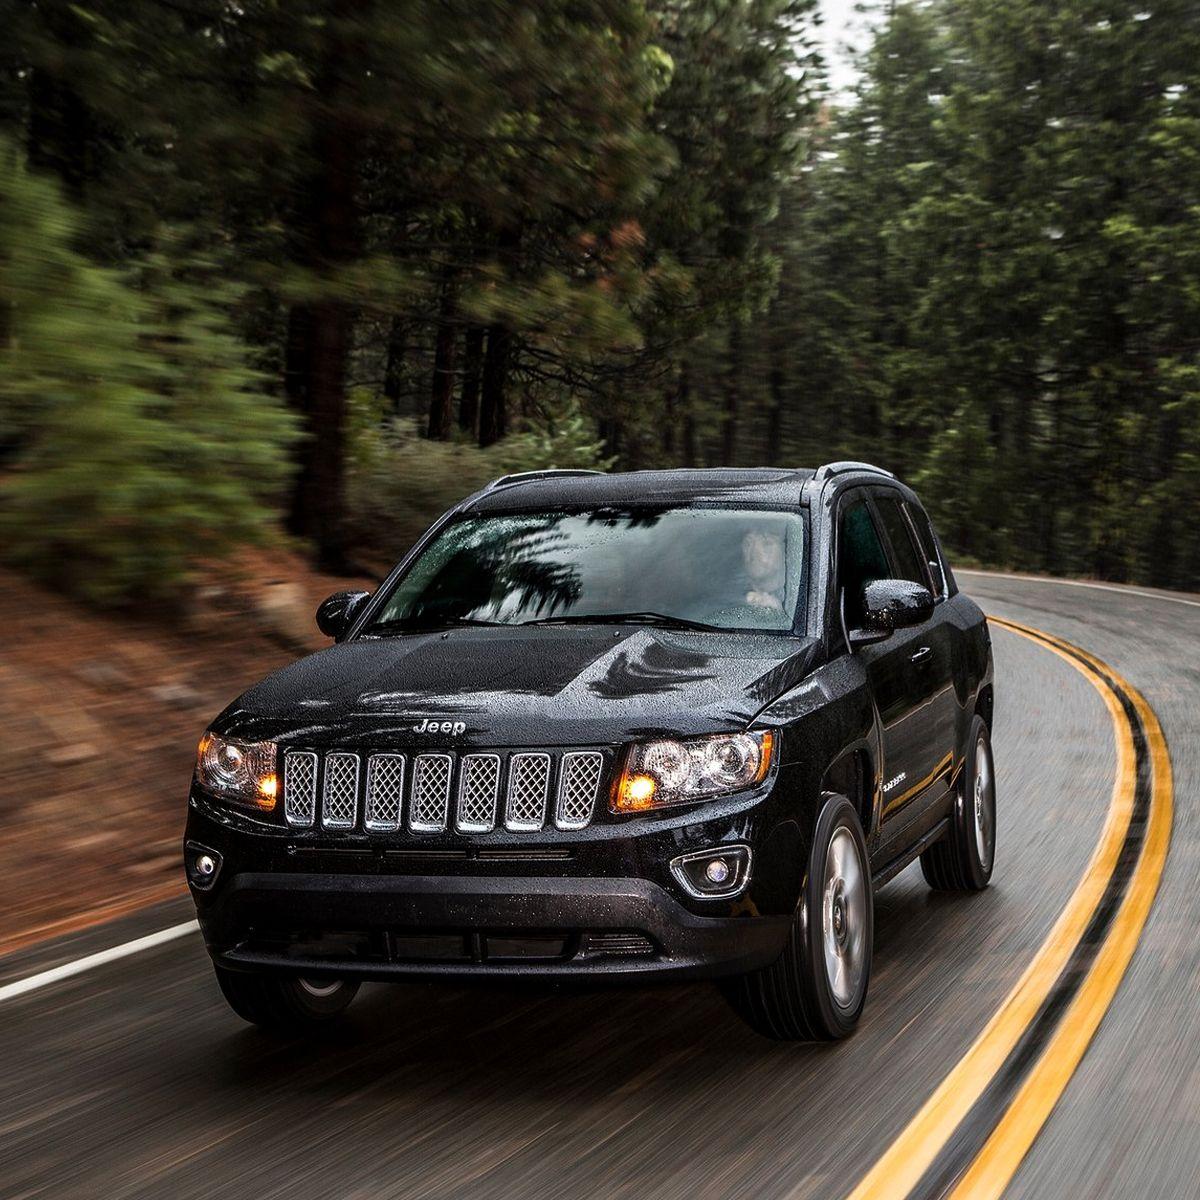 Jeep Compass Jeep Compass Limited Jeep Compass Chrysler Dodge Jeep